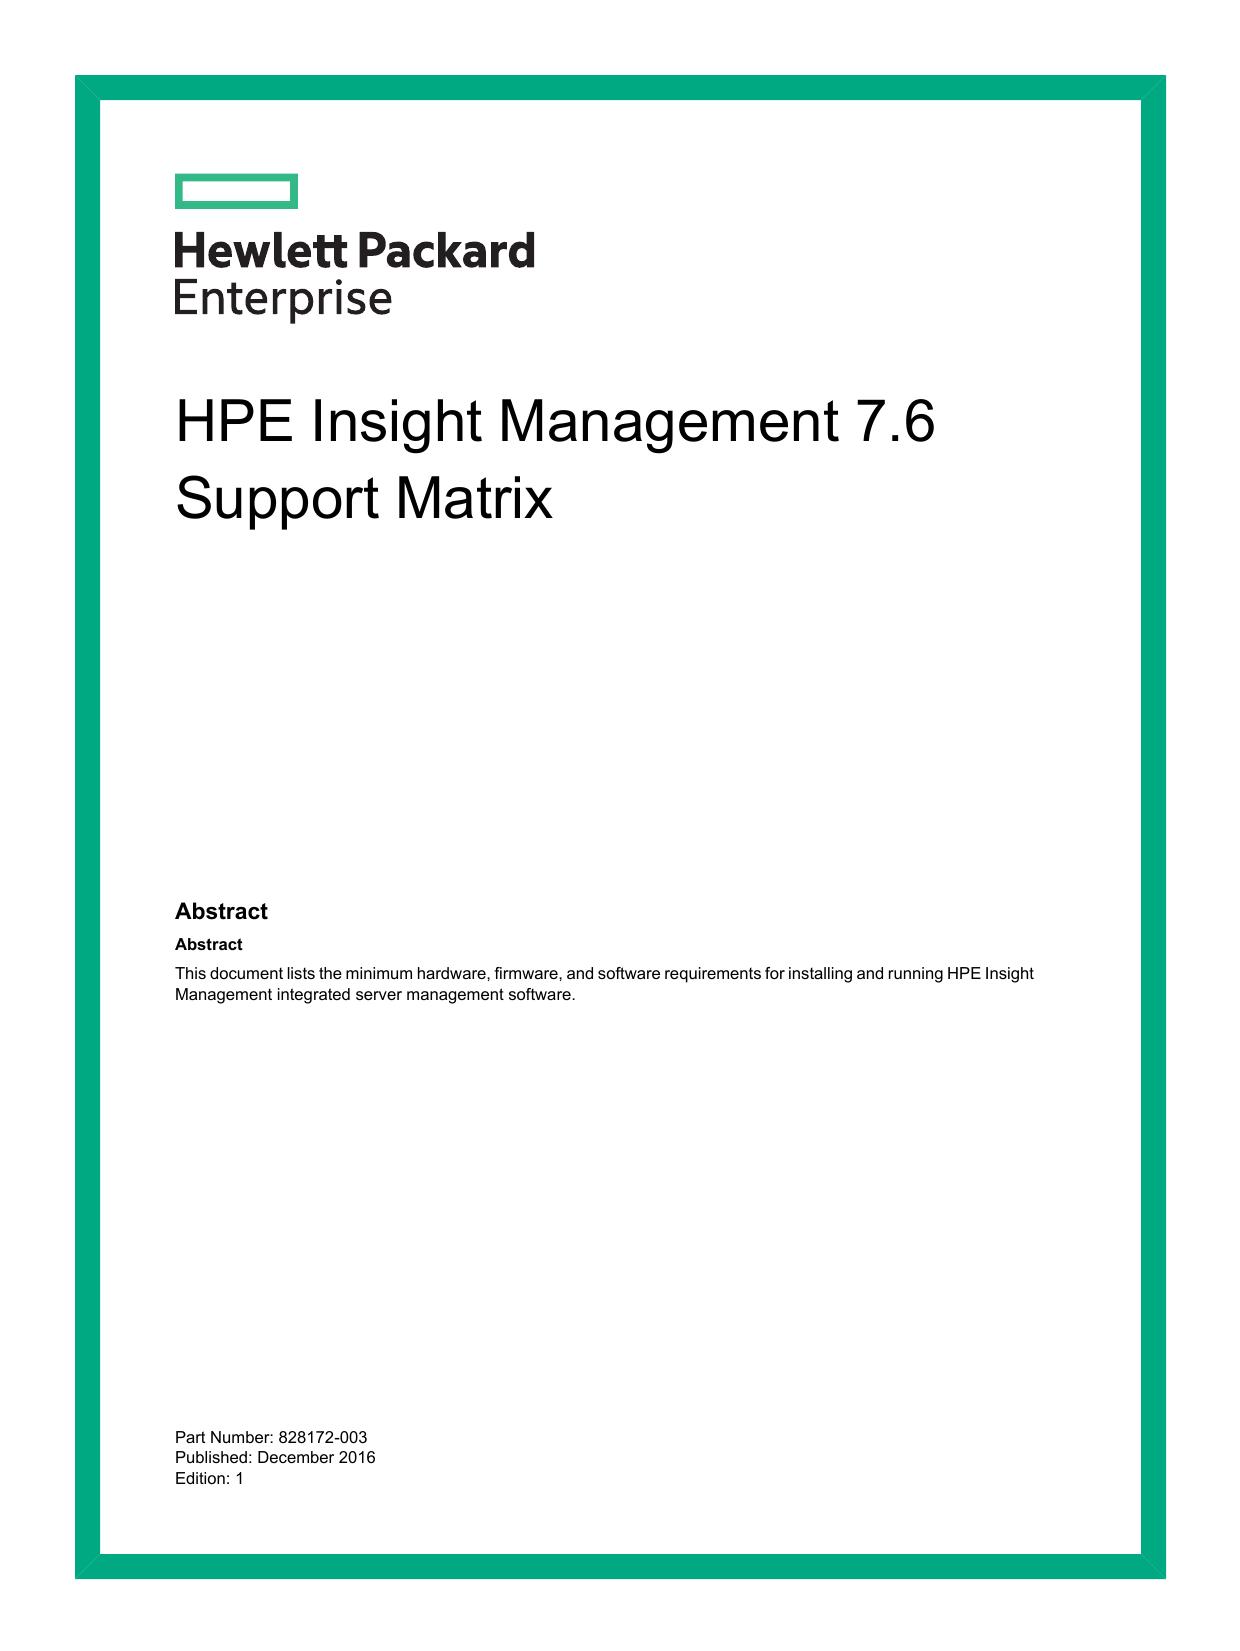 hp p6500 firmware